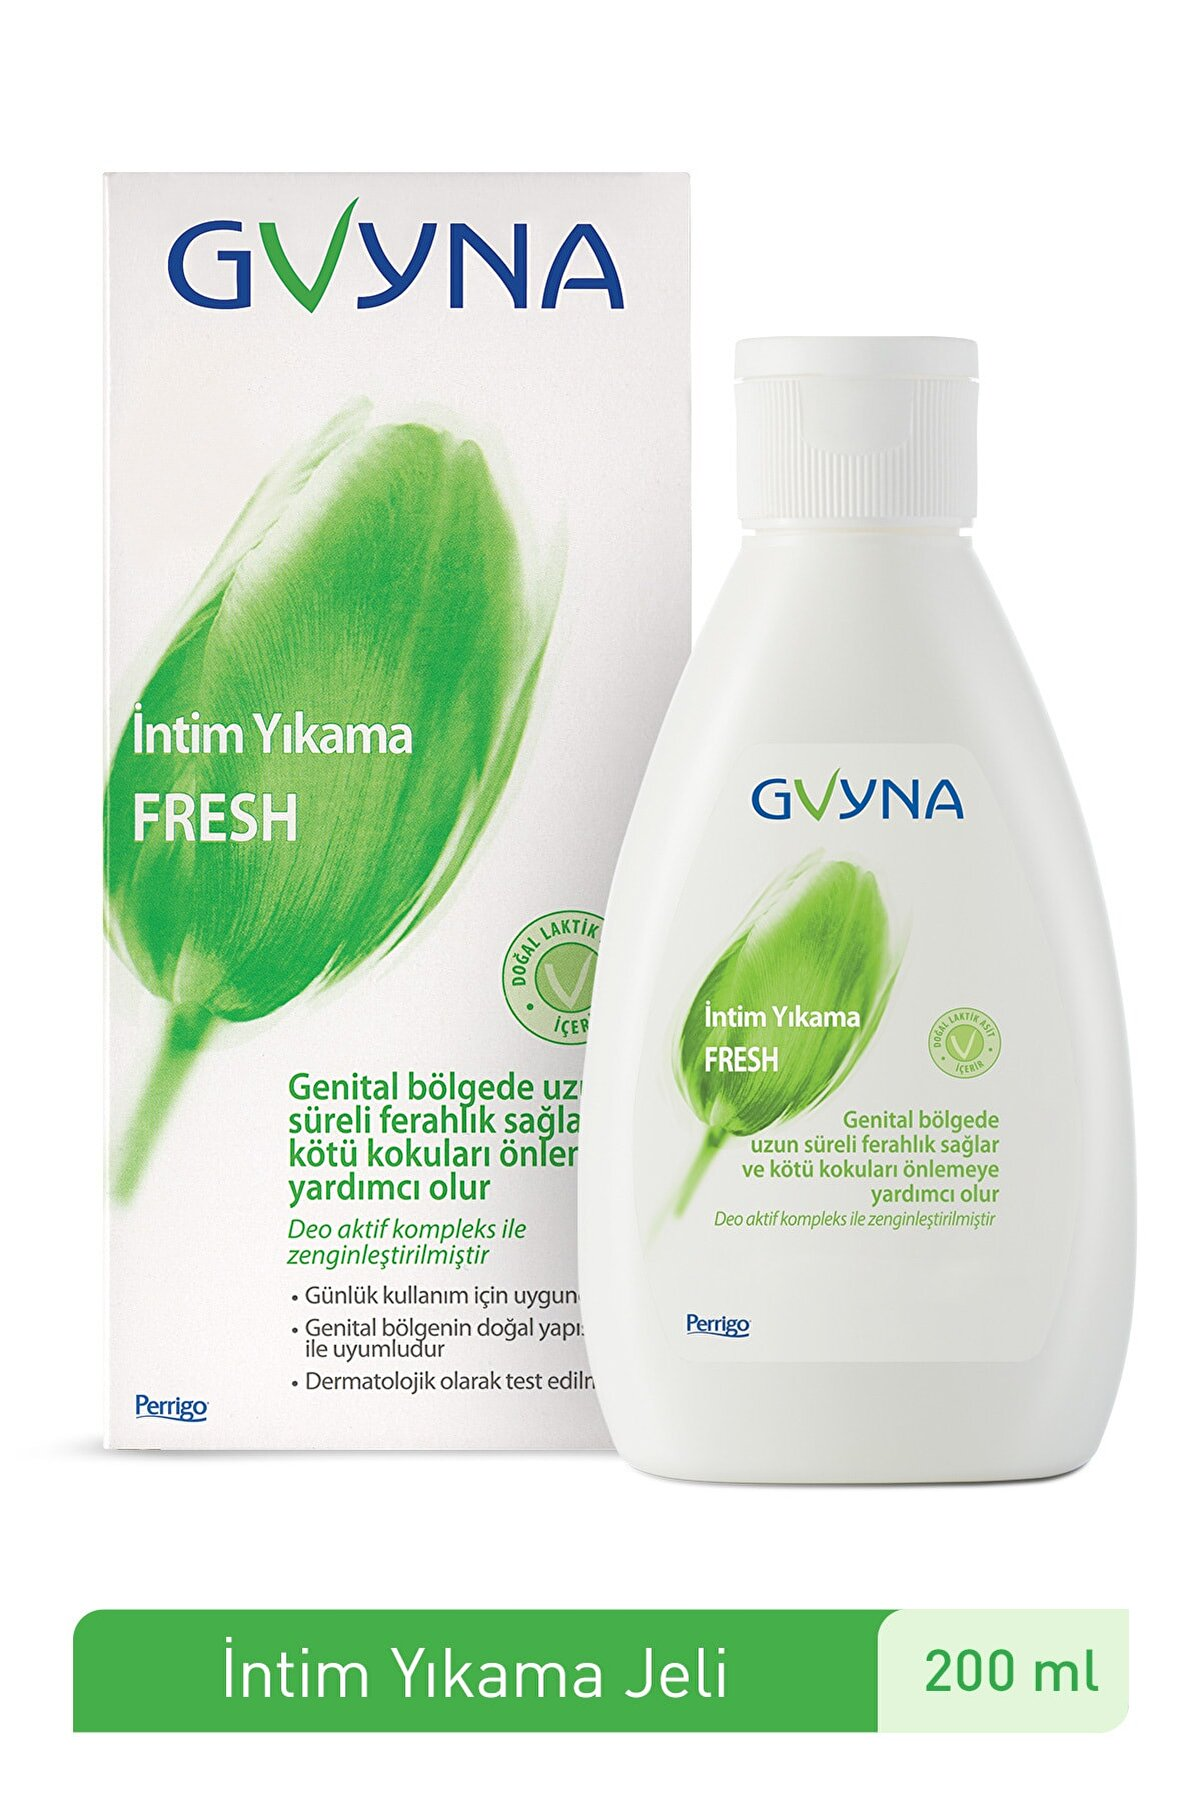 Gvyna Intim Yıkama Fresh 200 ml